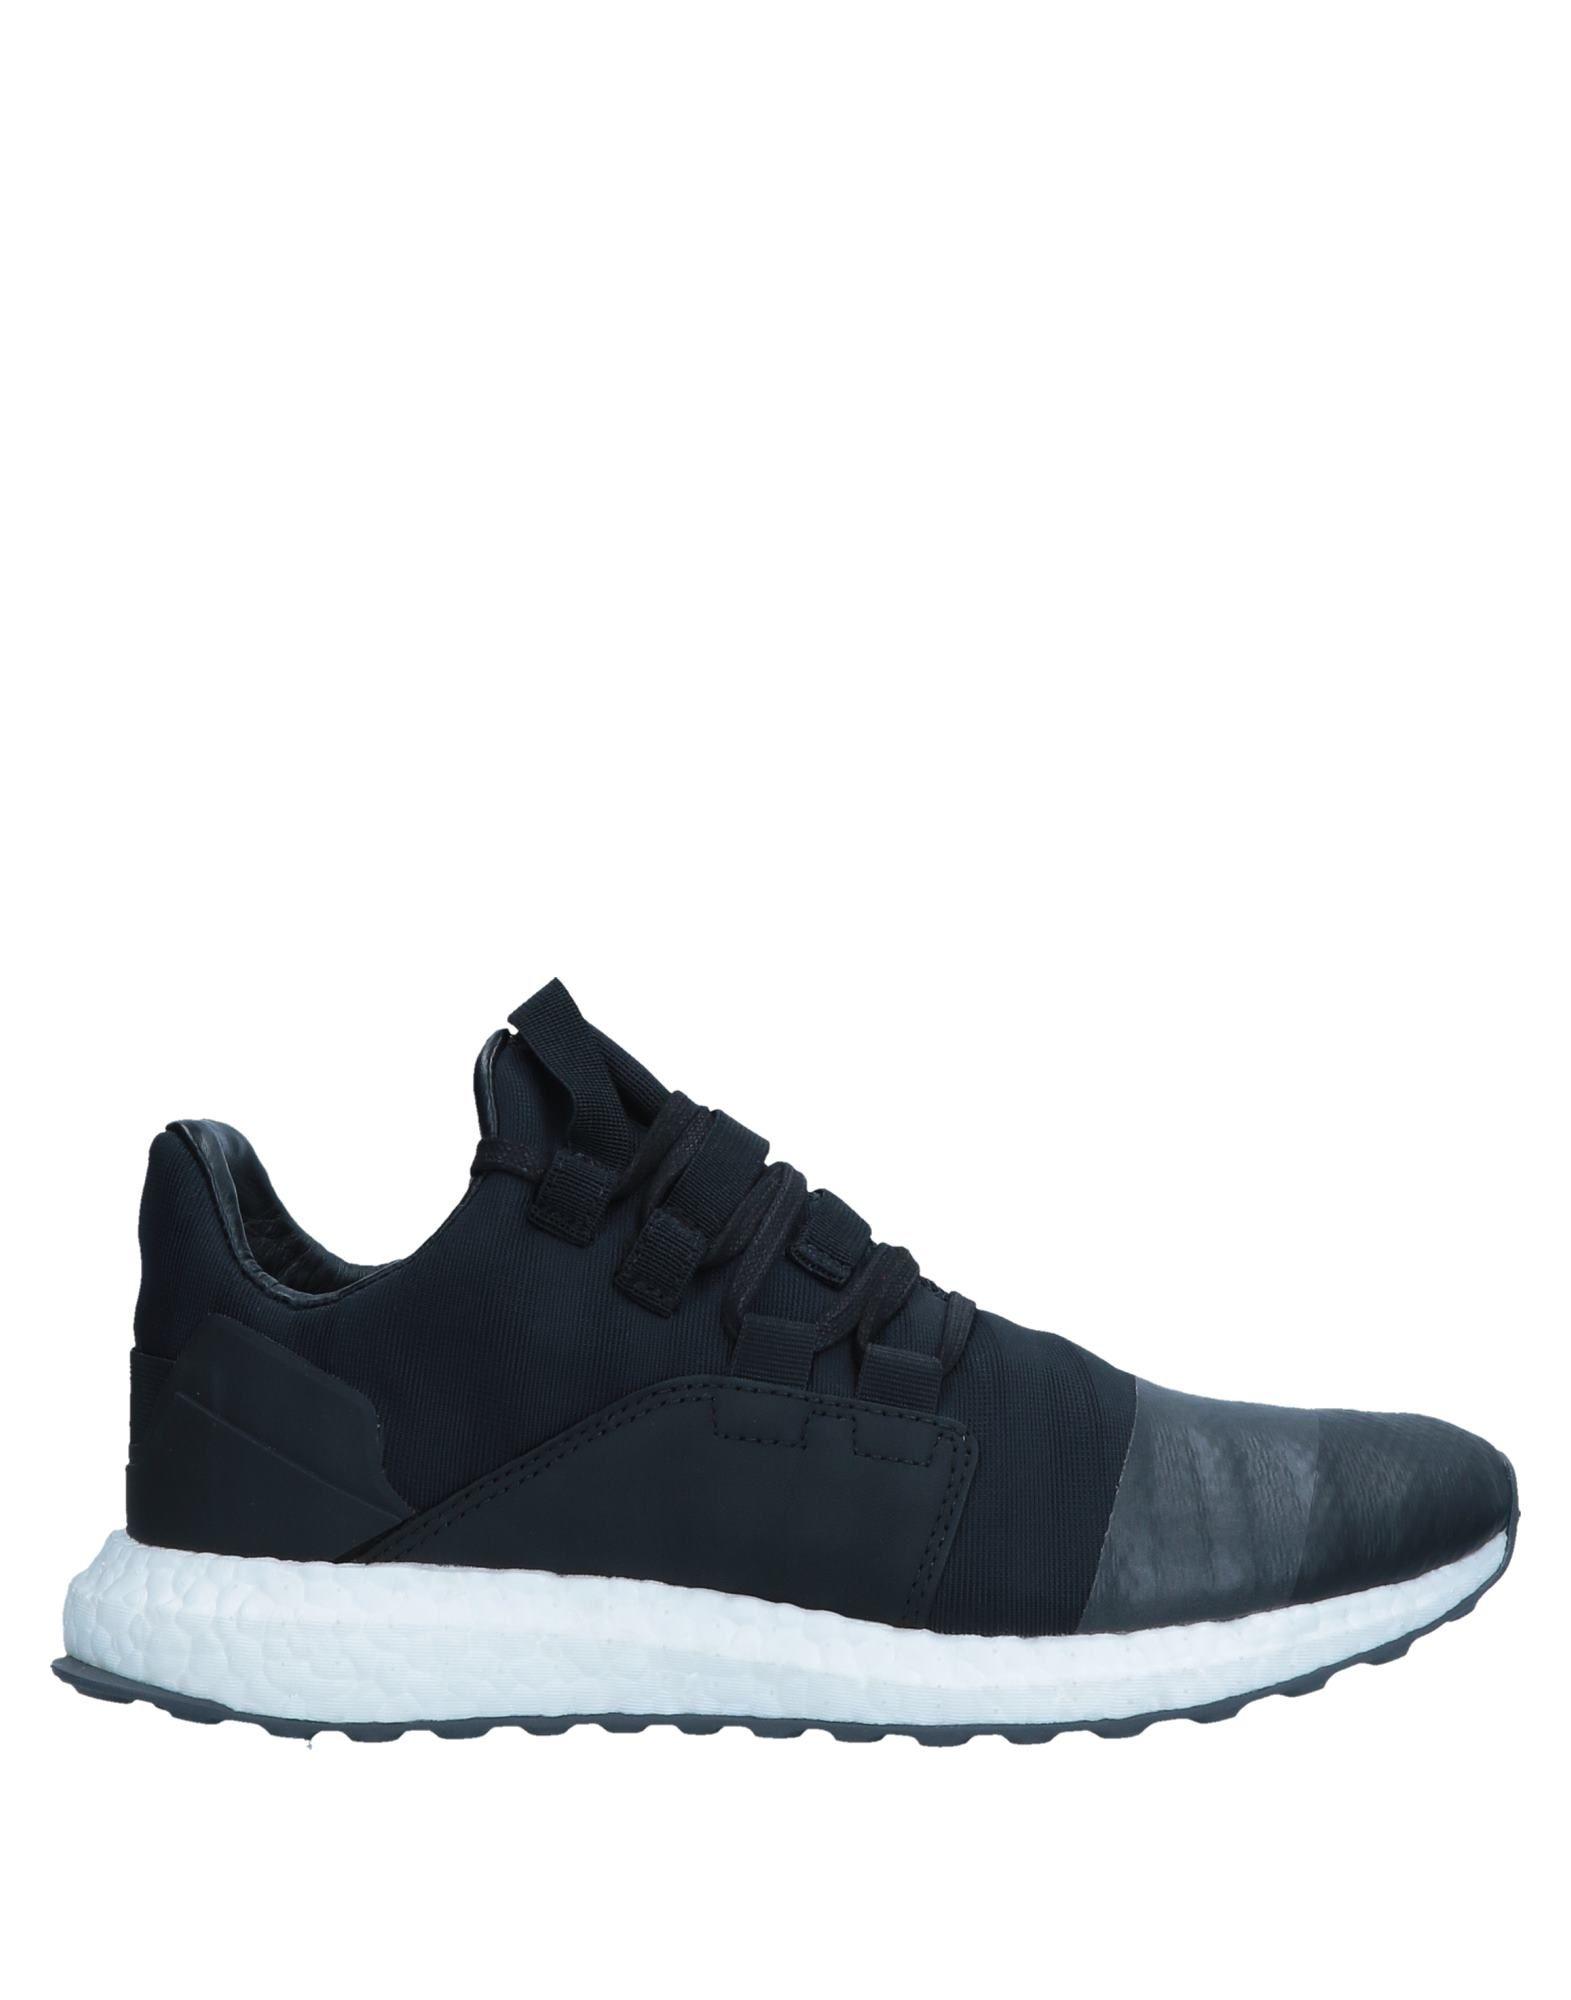 Adidas 11551855BW By Yohji Yamamoto Sneakers Herren  11551855BW Adidas Gute Qualität beliebte Schuhe 155e5b